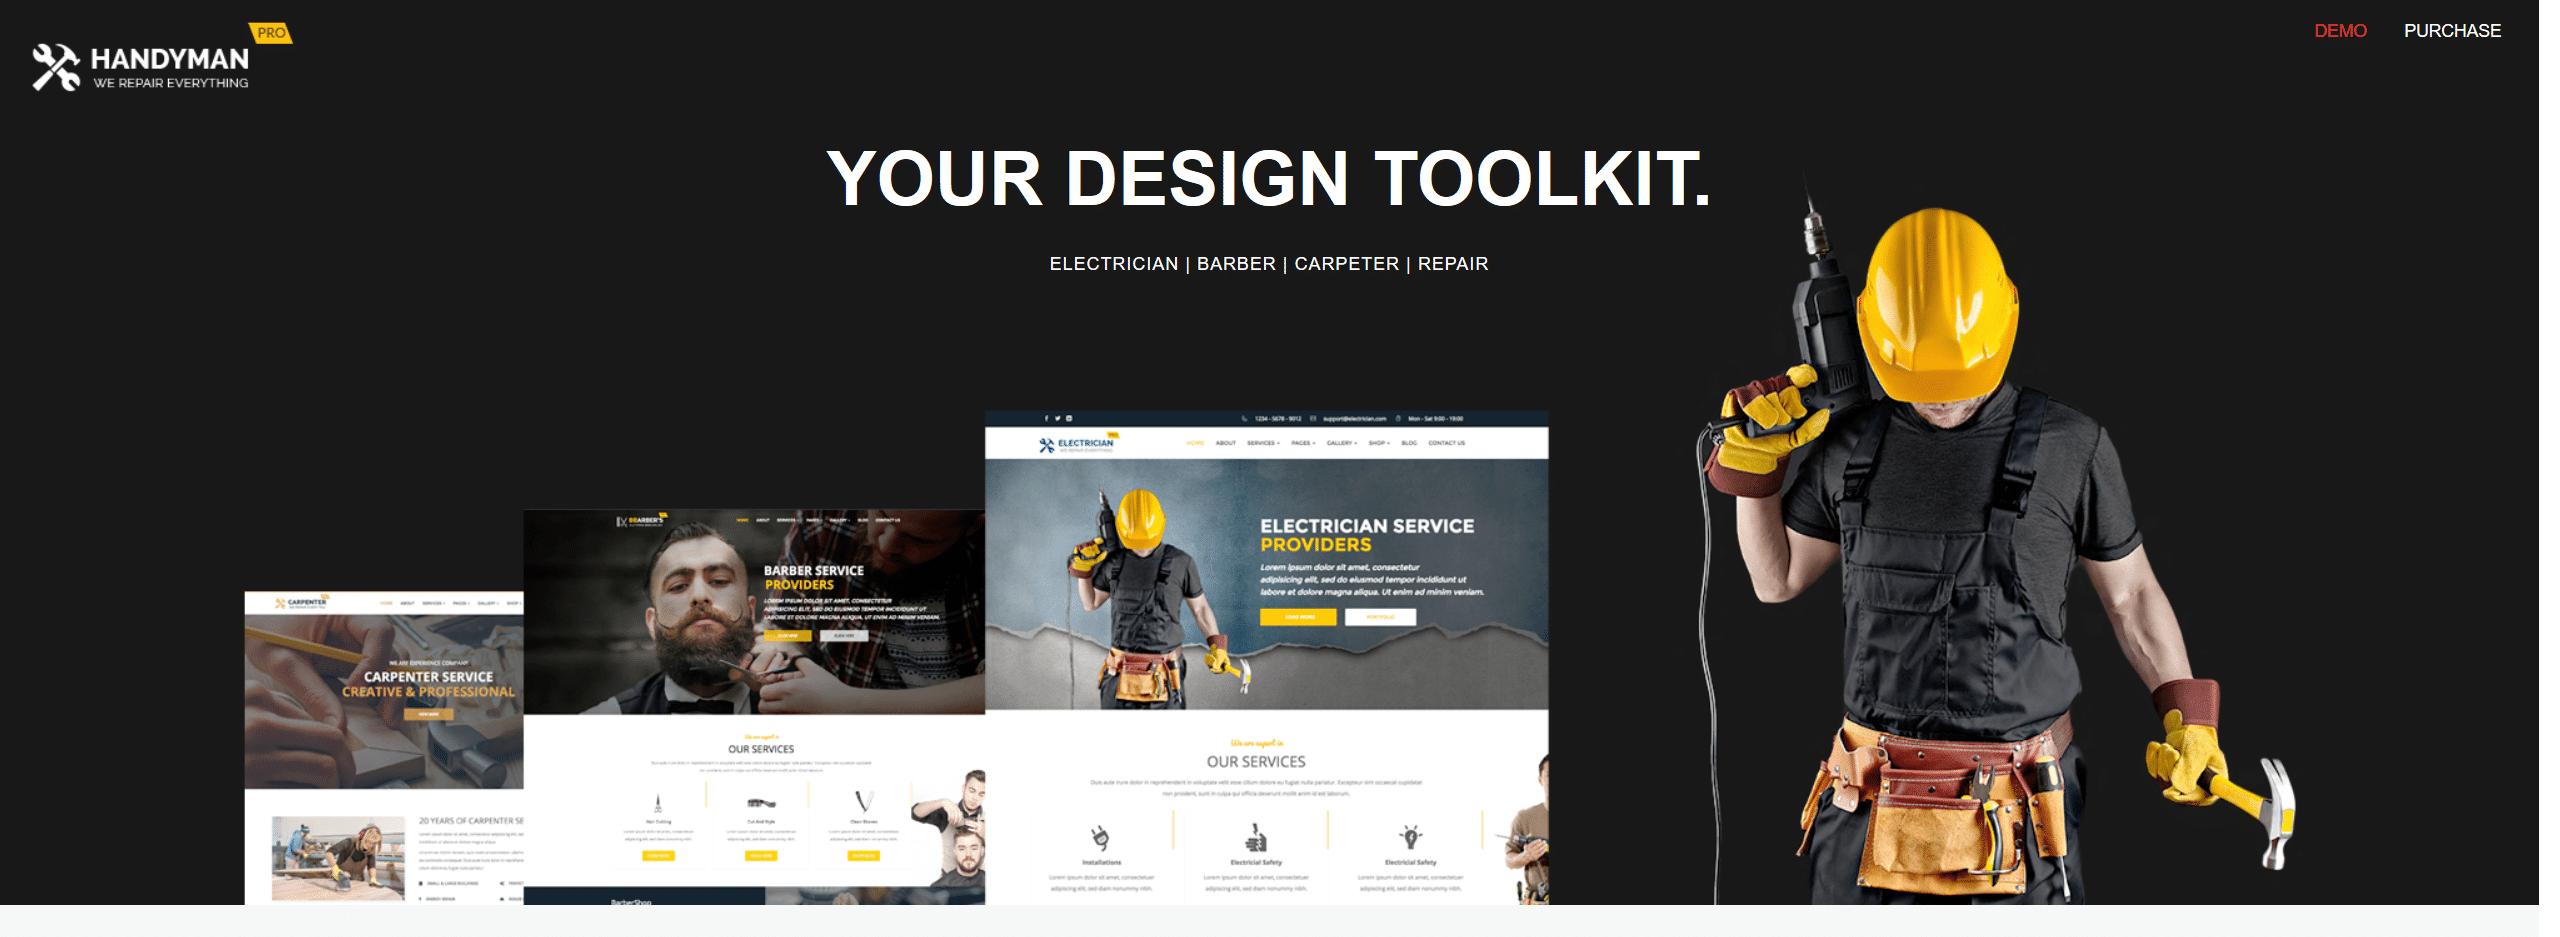 web design services, website design, wordpress website